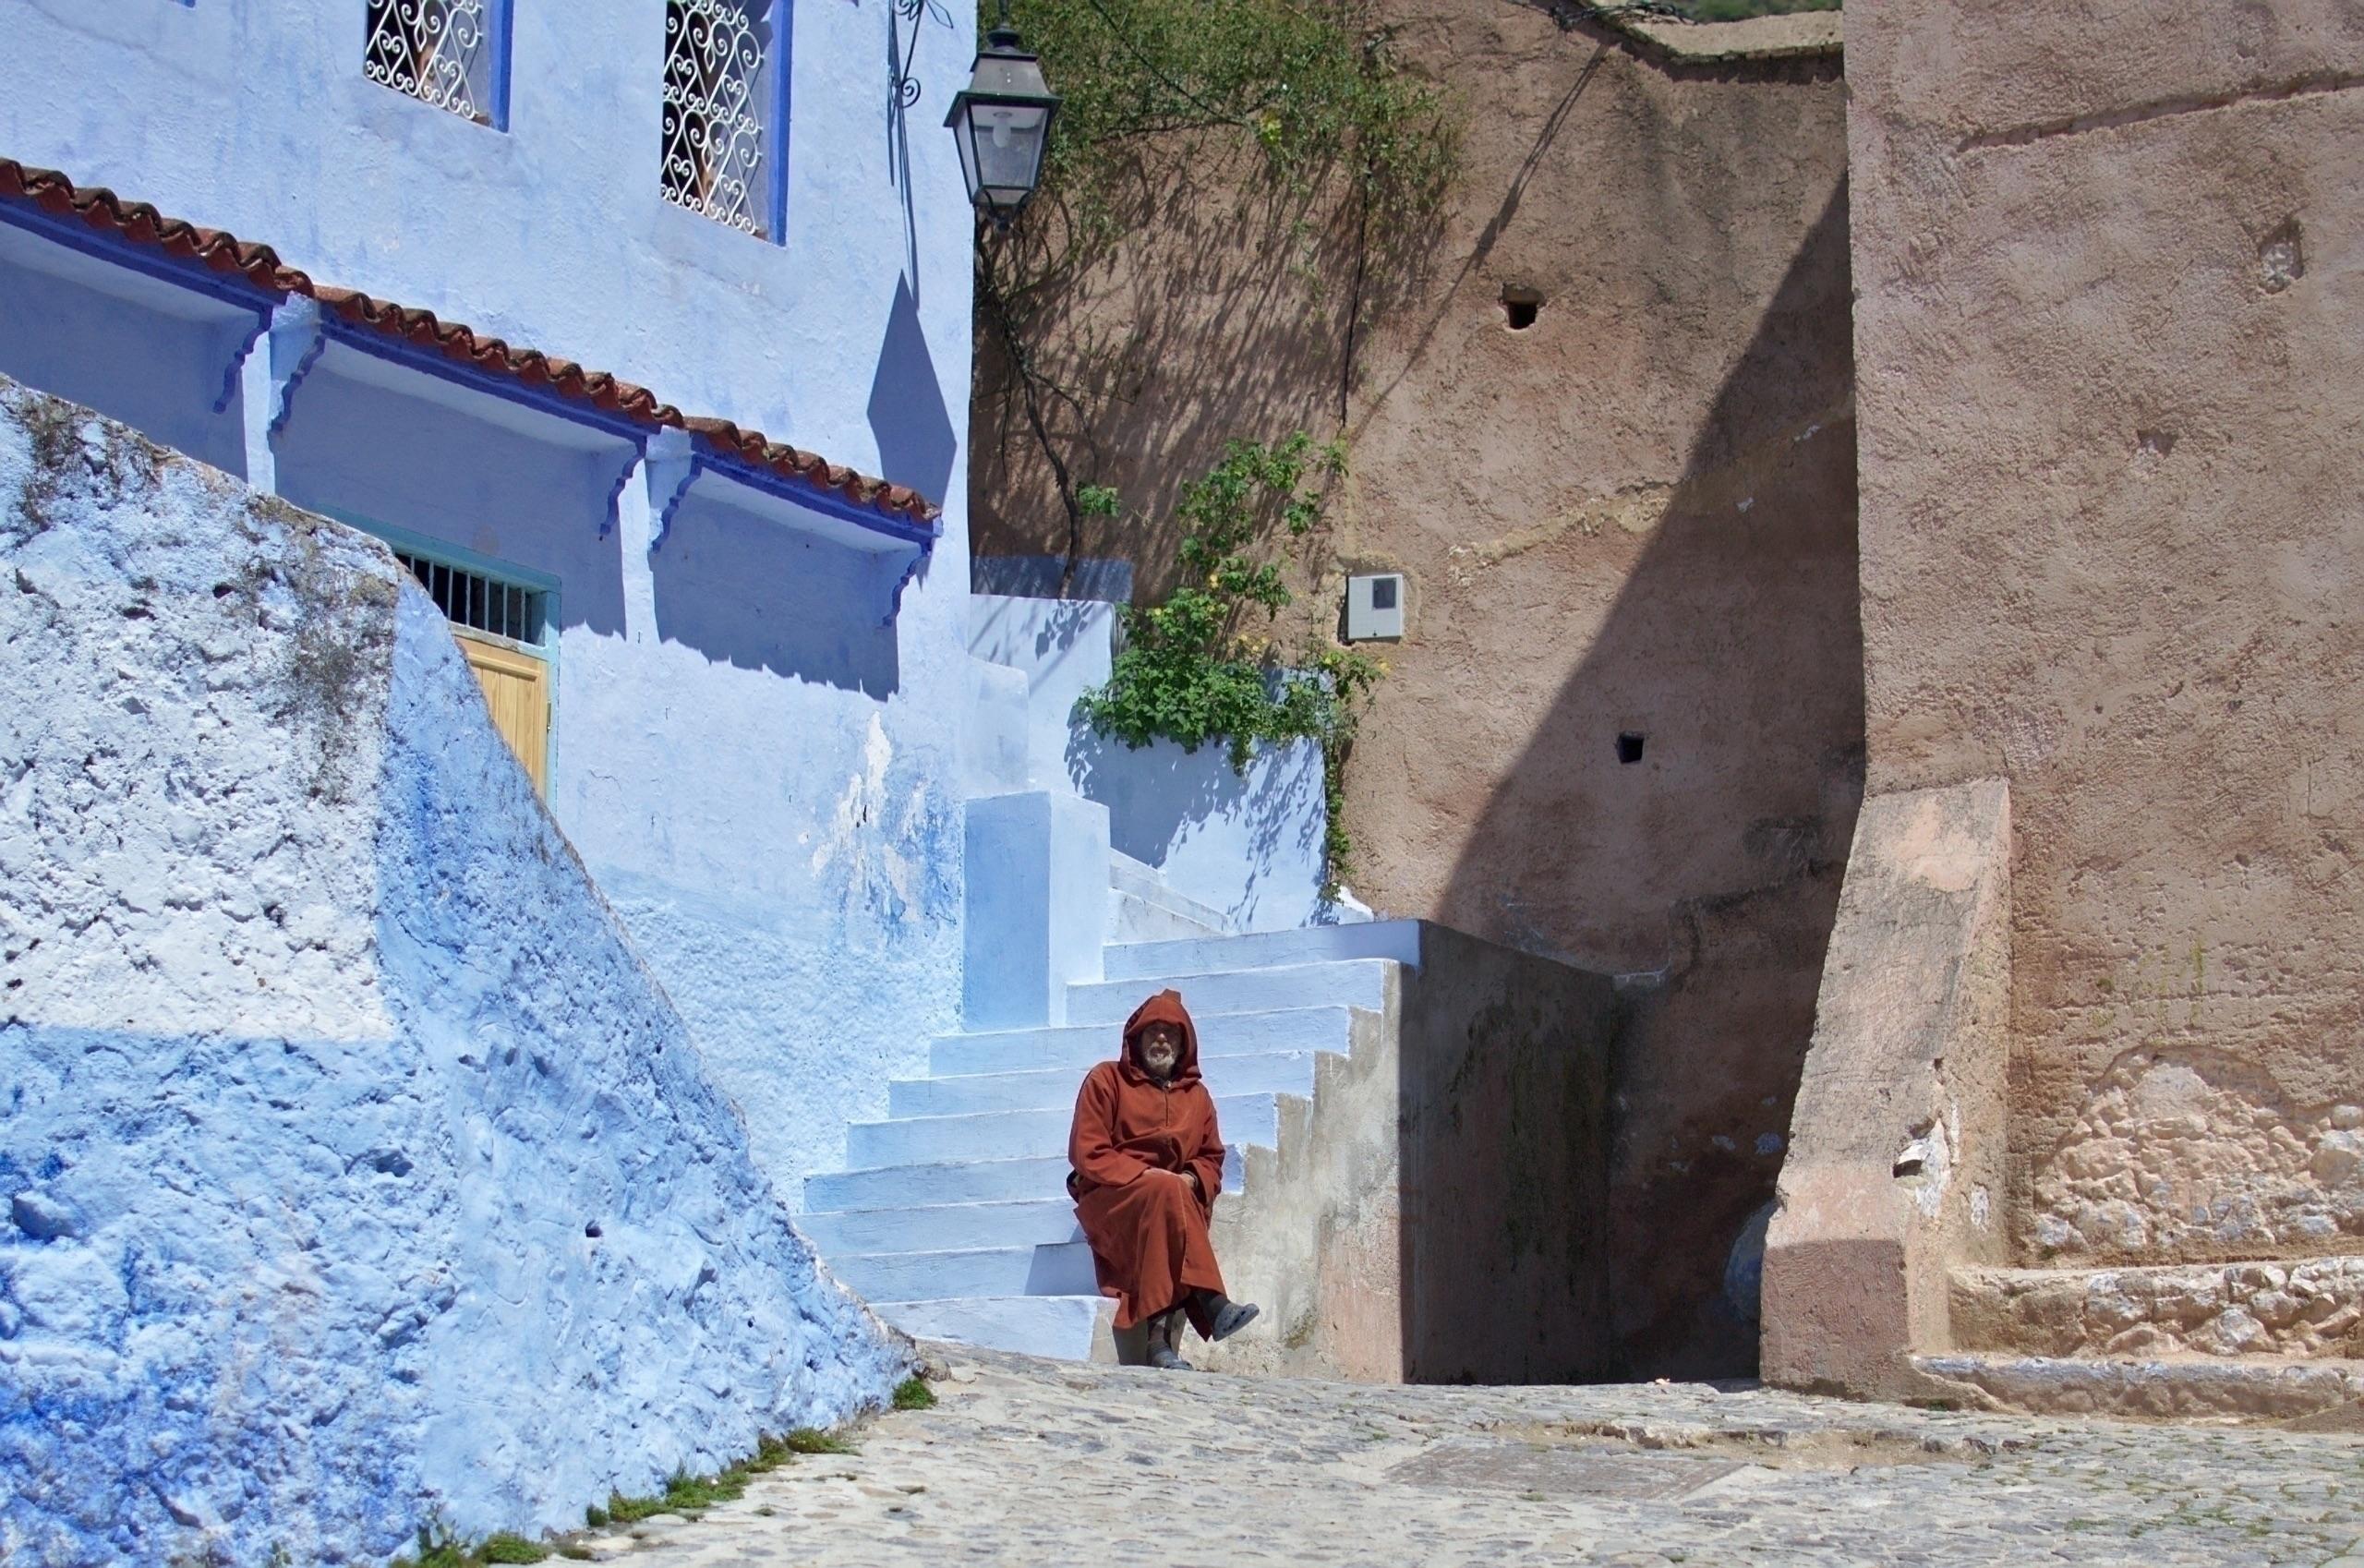 Monk, Morocco (2015 - bluecity, chefchaouen - janekpaul | ello